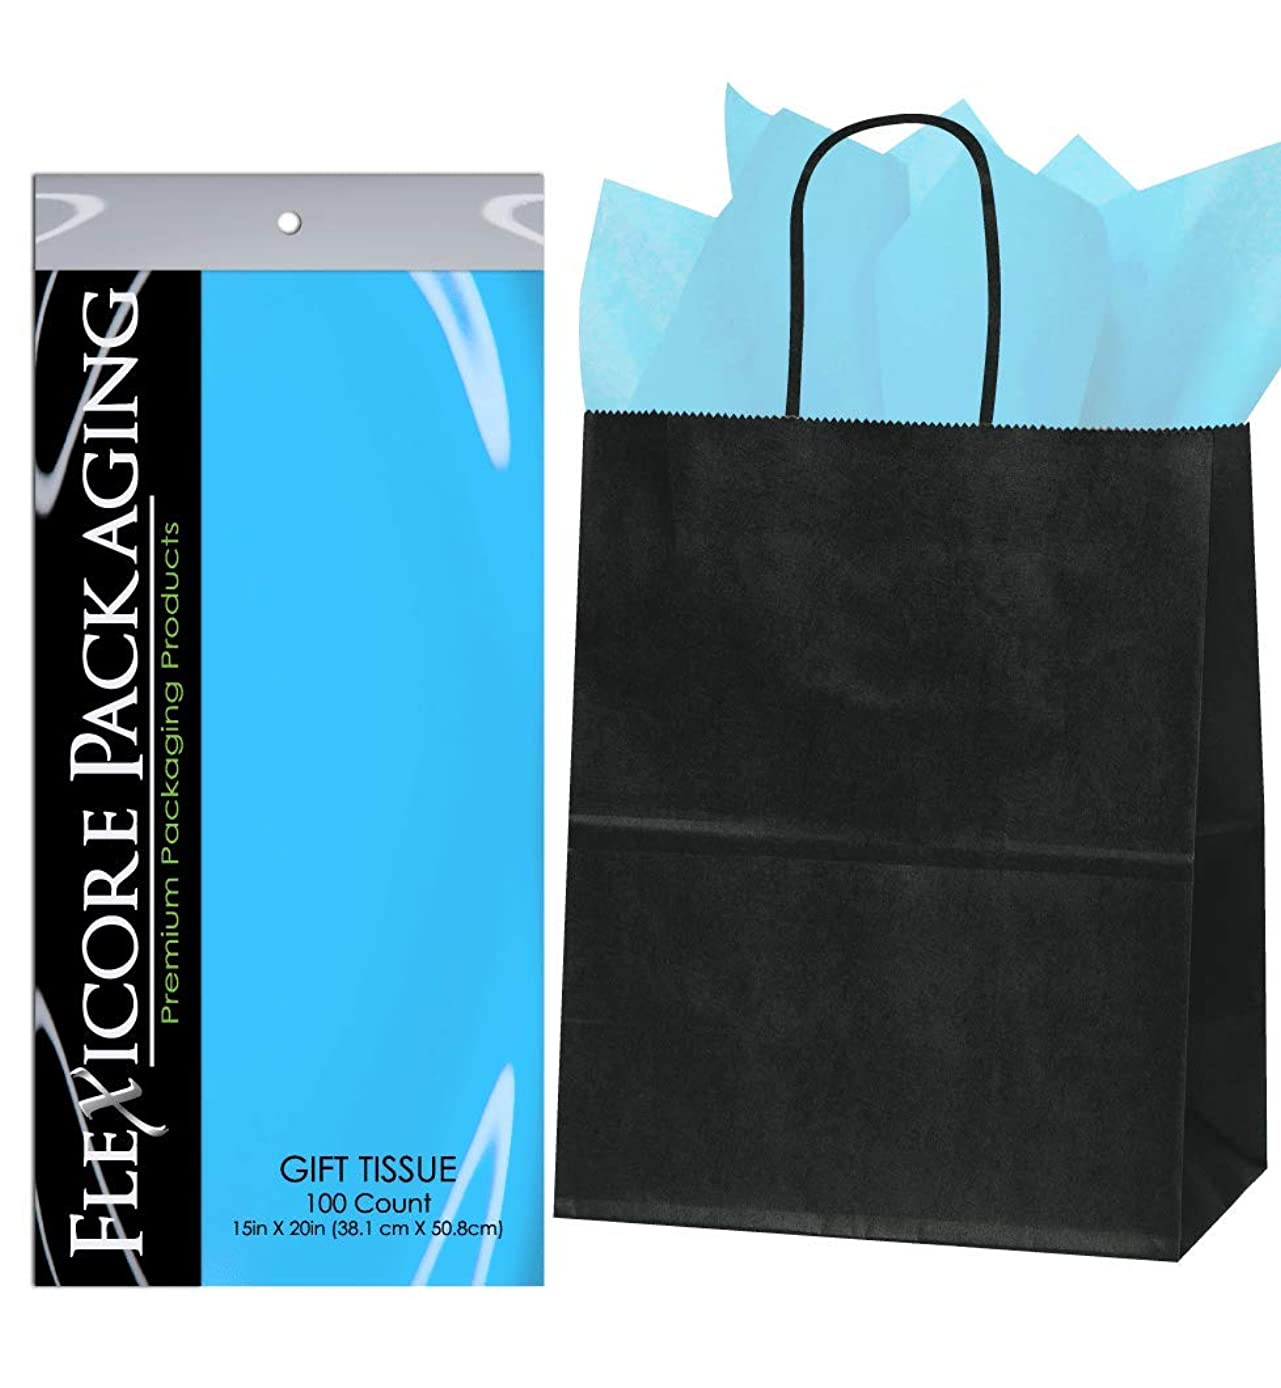 Flexicore Packaging? 50ct Black Kraft Paper Gift Bags + 100ct Gift Tissue Paper (Light Blue)